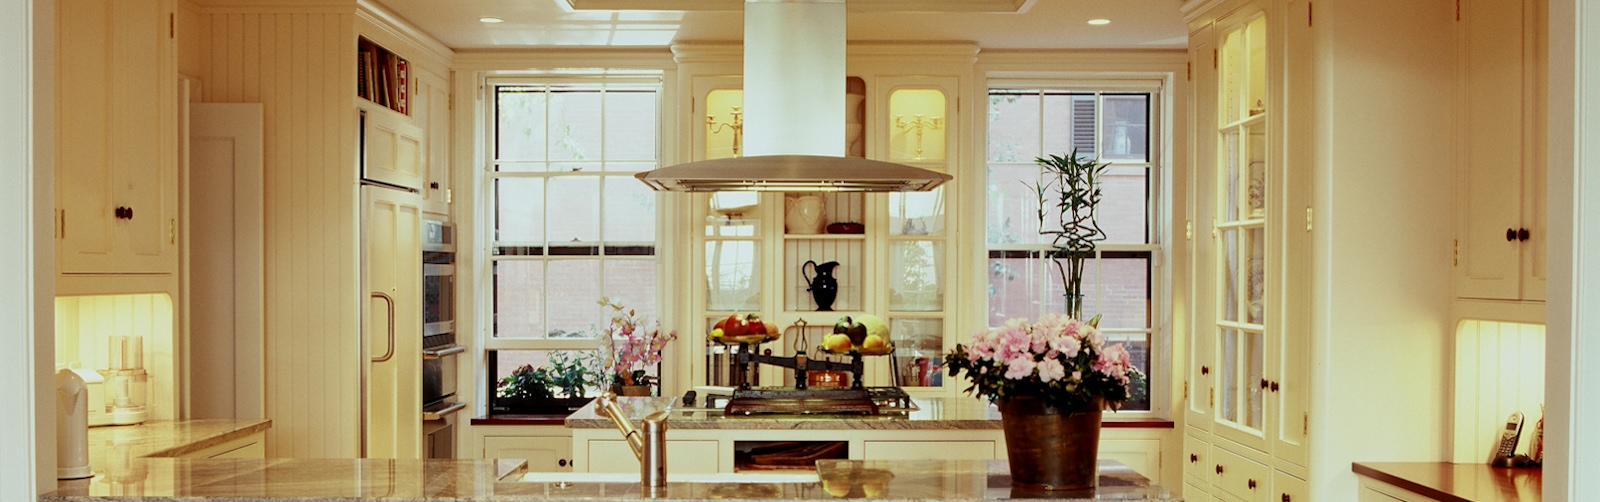 Kitchen Renovation Boston by Connaughton Construction.